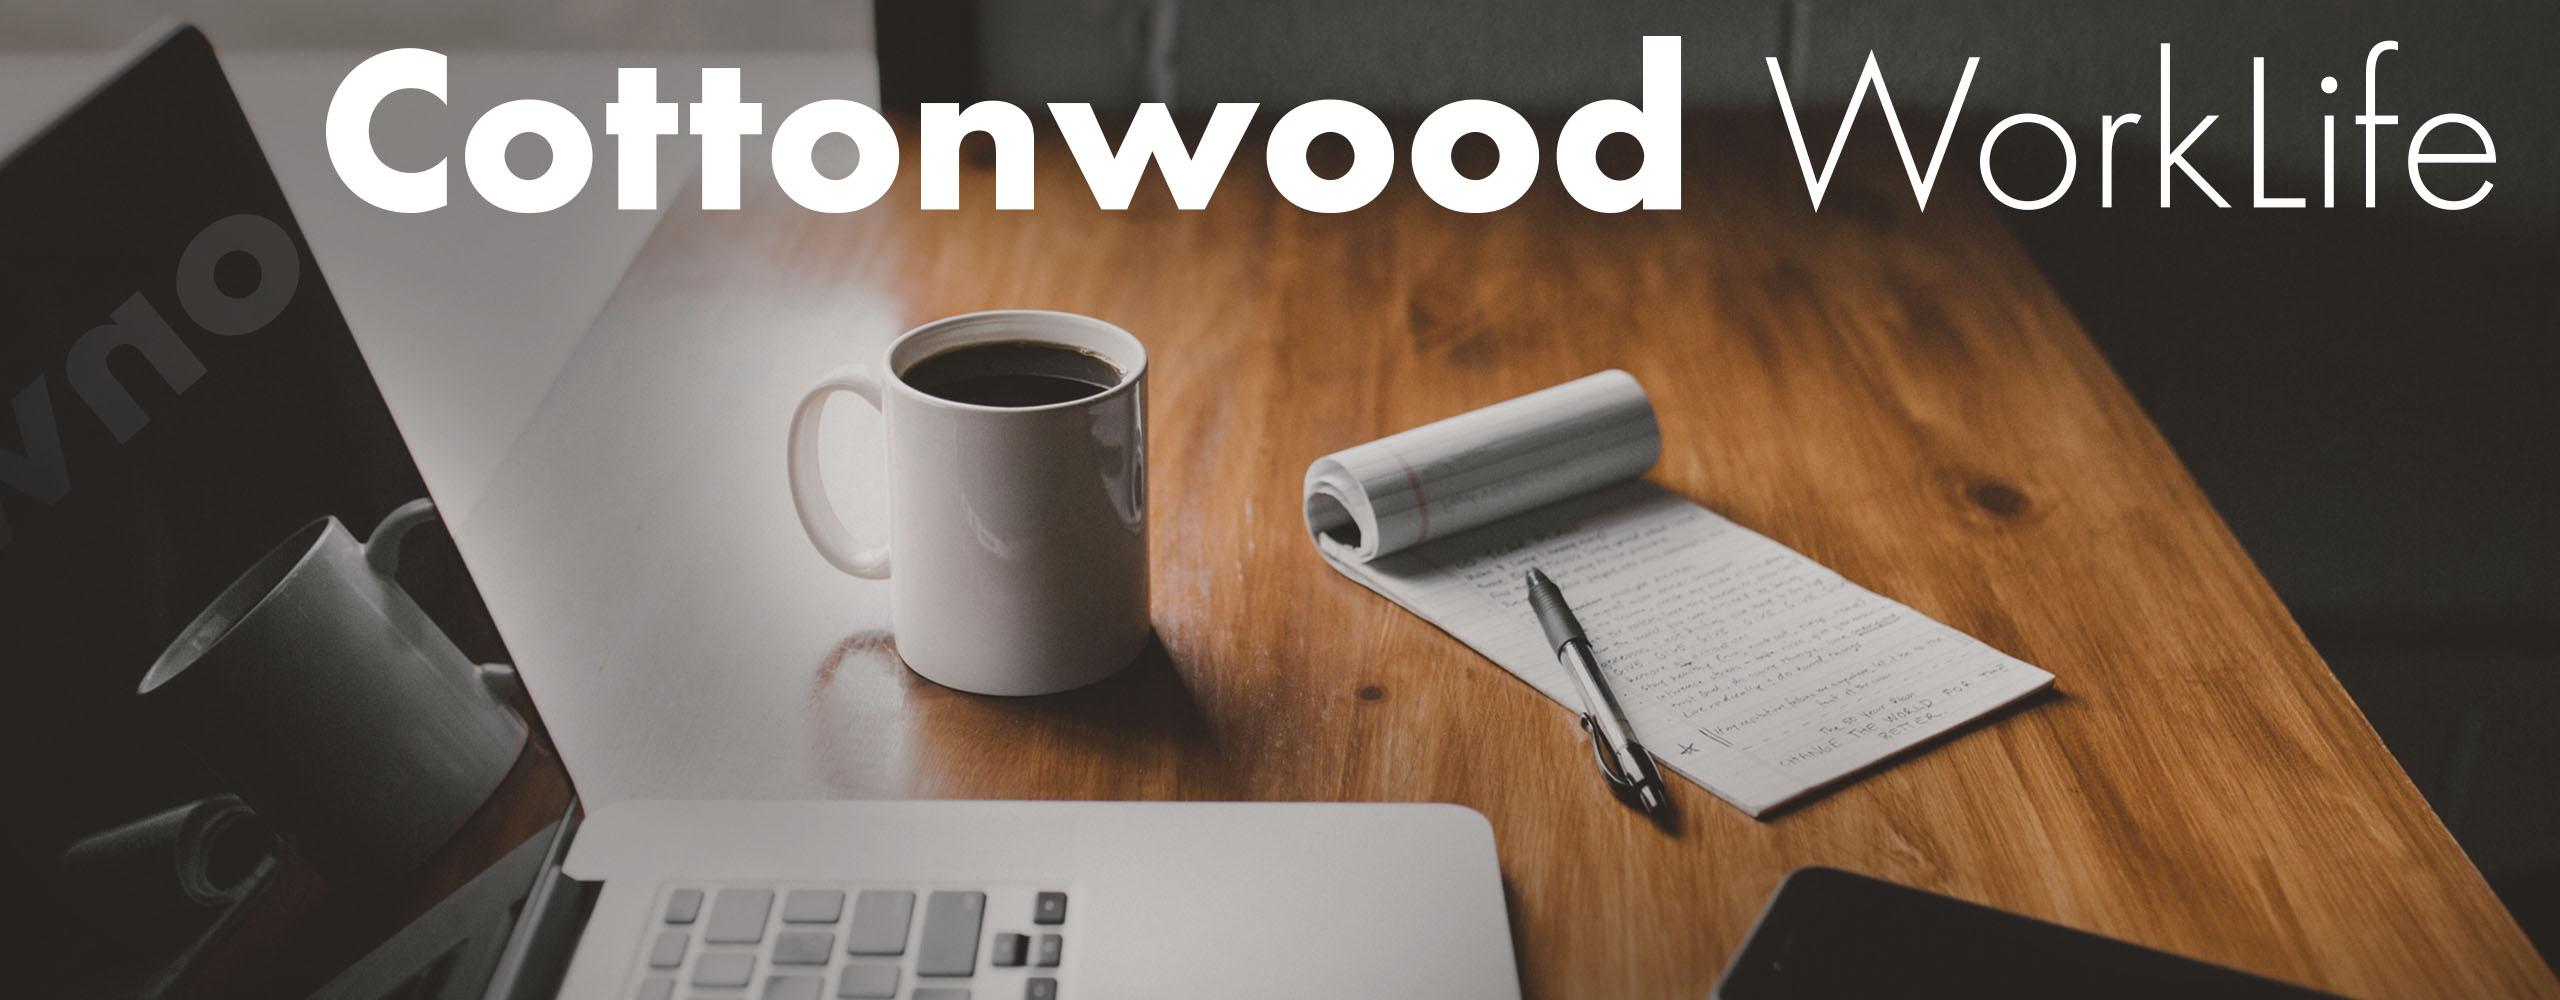 Cottonwood work life